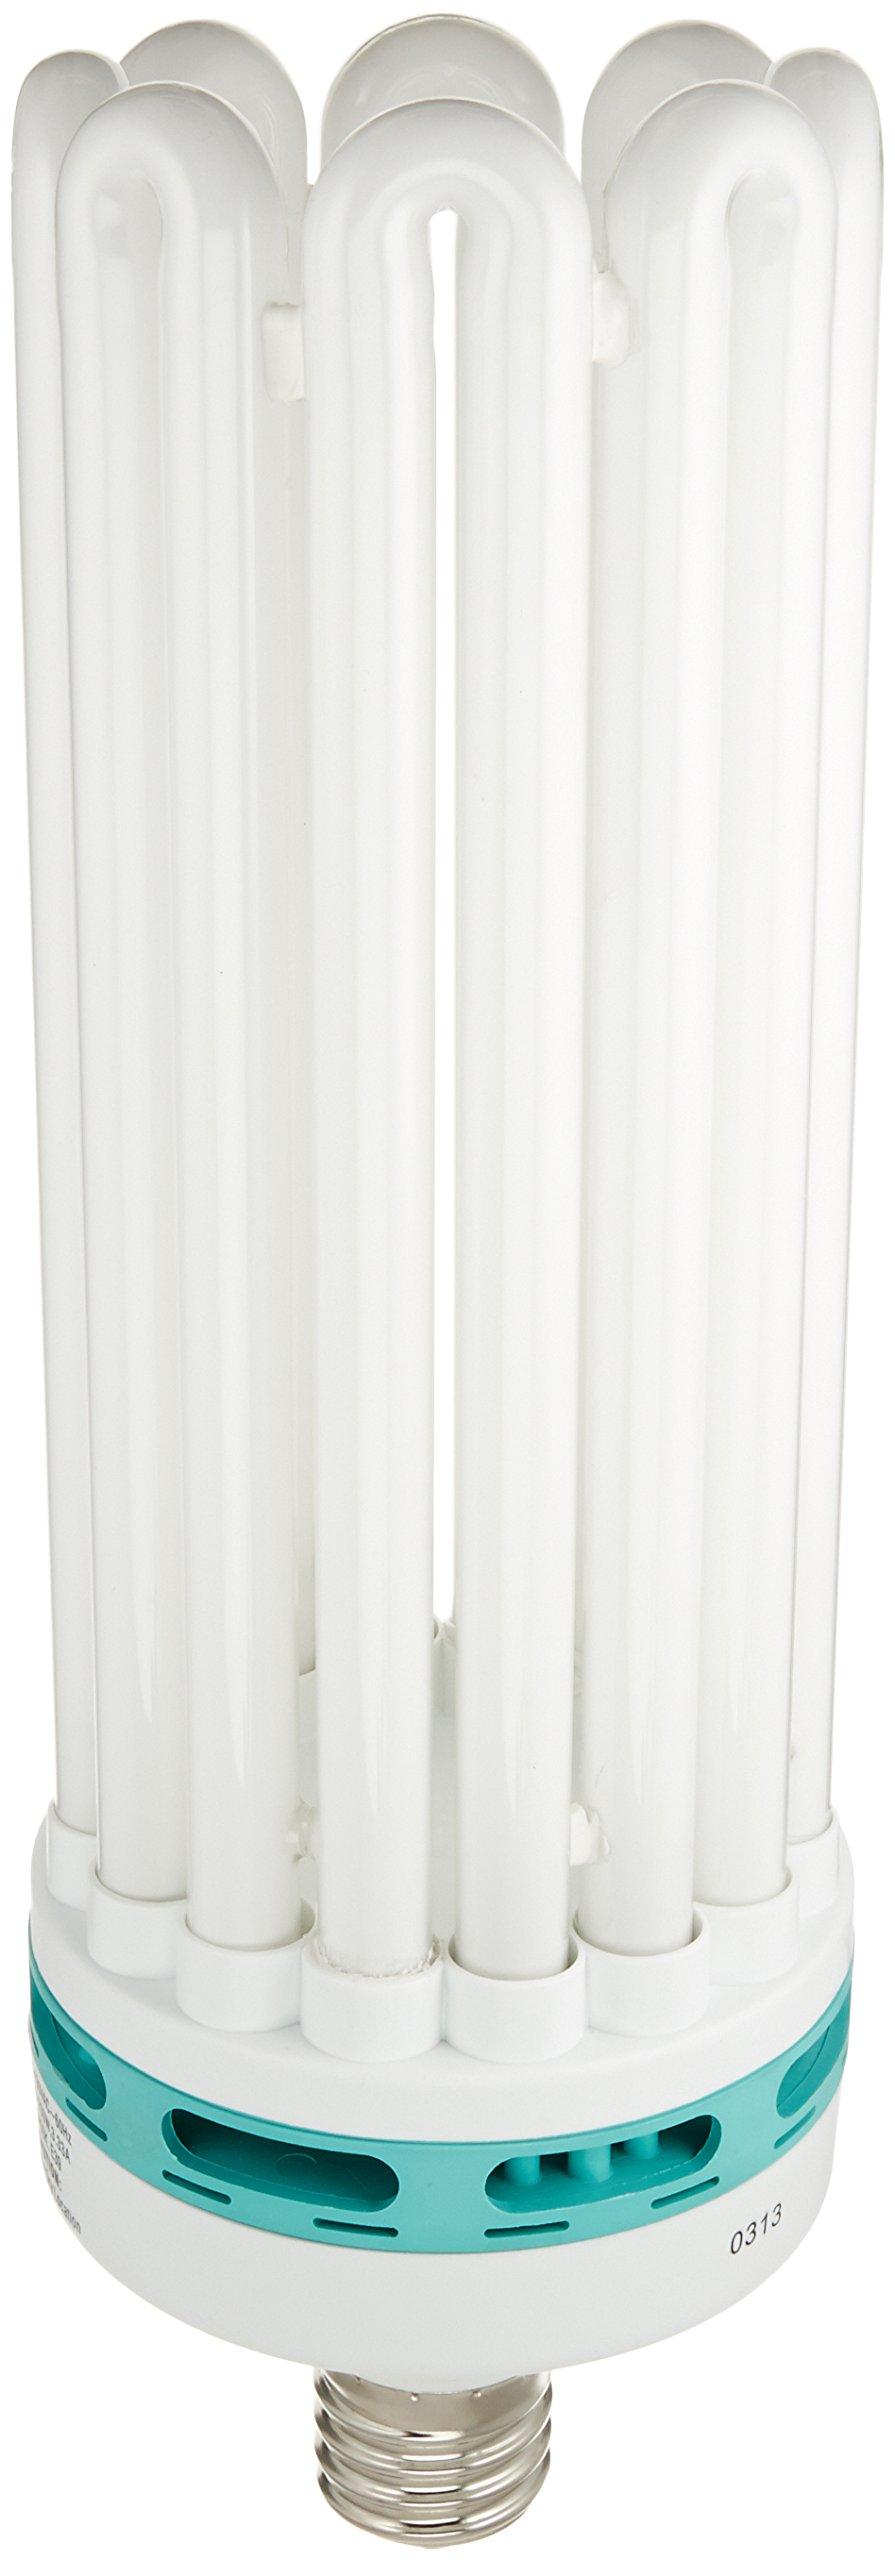 SunBlaster CFL Self ballasted Propagation lamp, 6400K Light Spectrum, 200 Watt, Use Mogual Size Light Socket